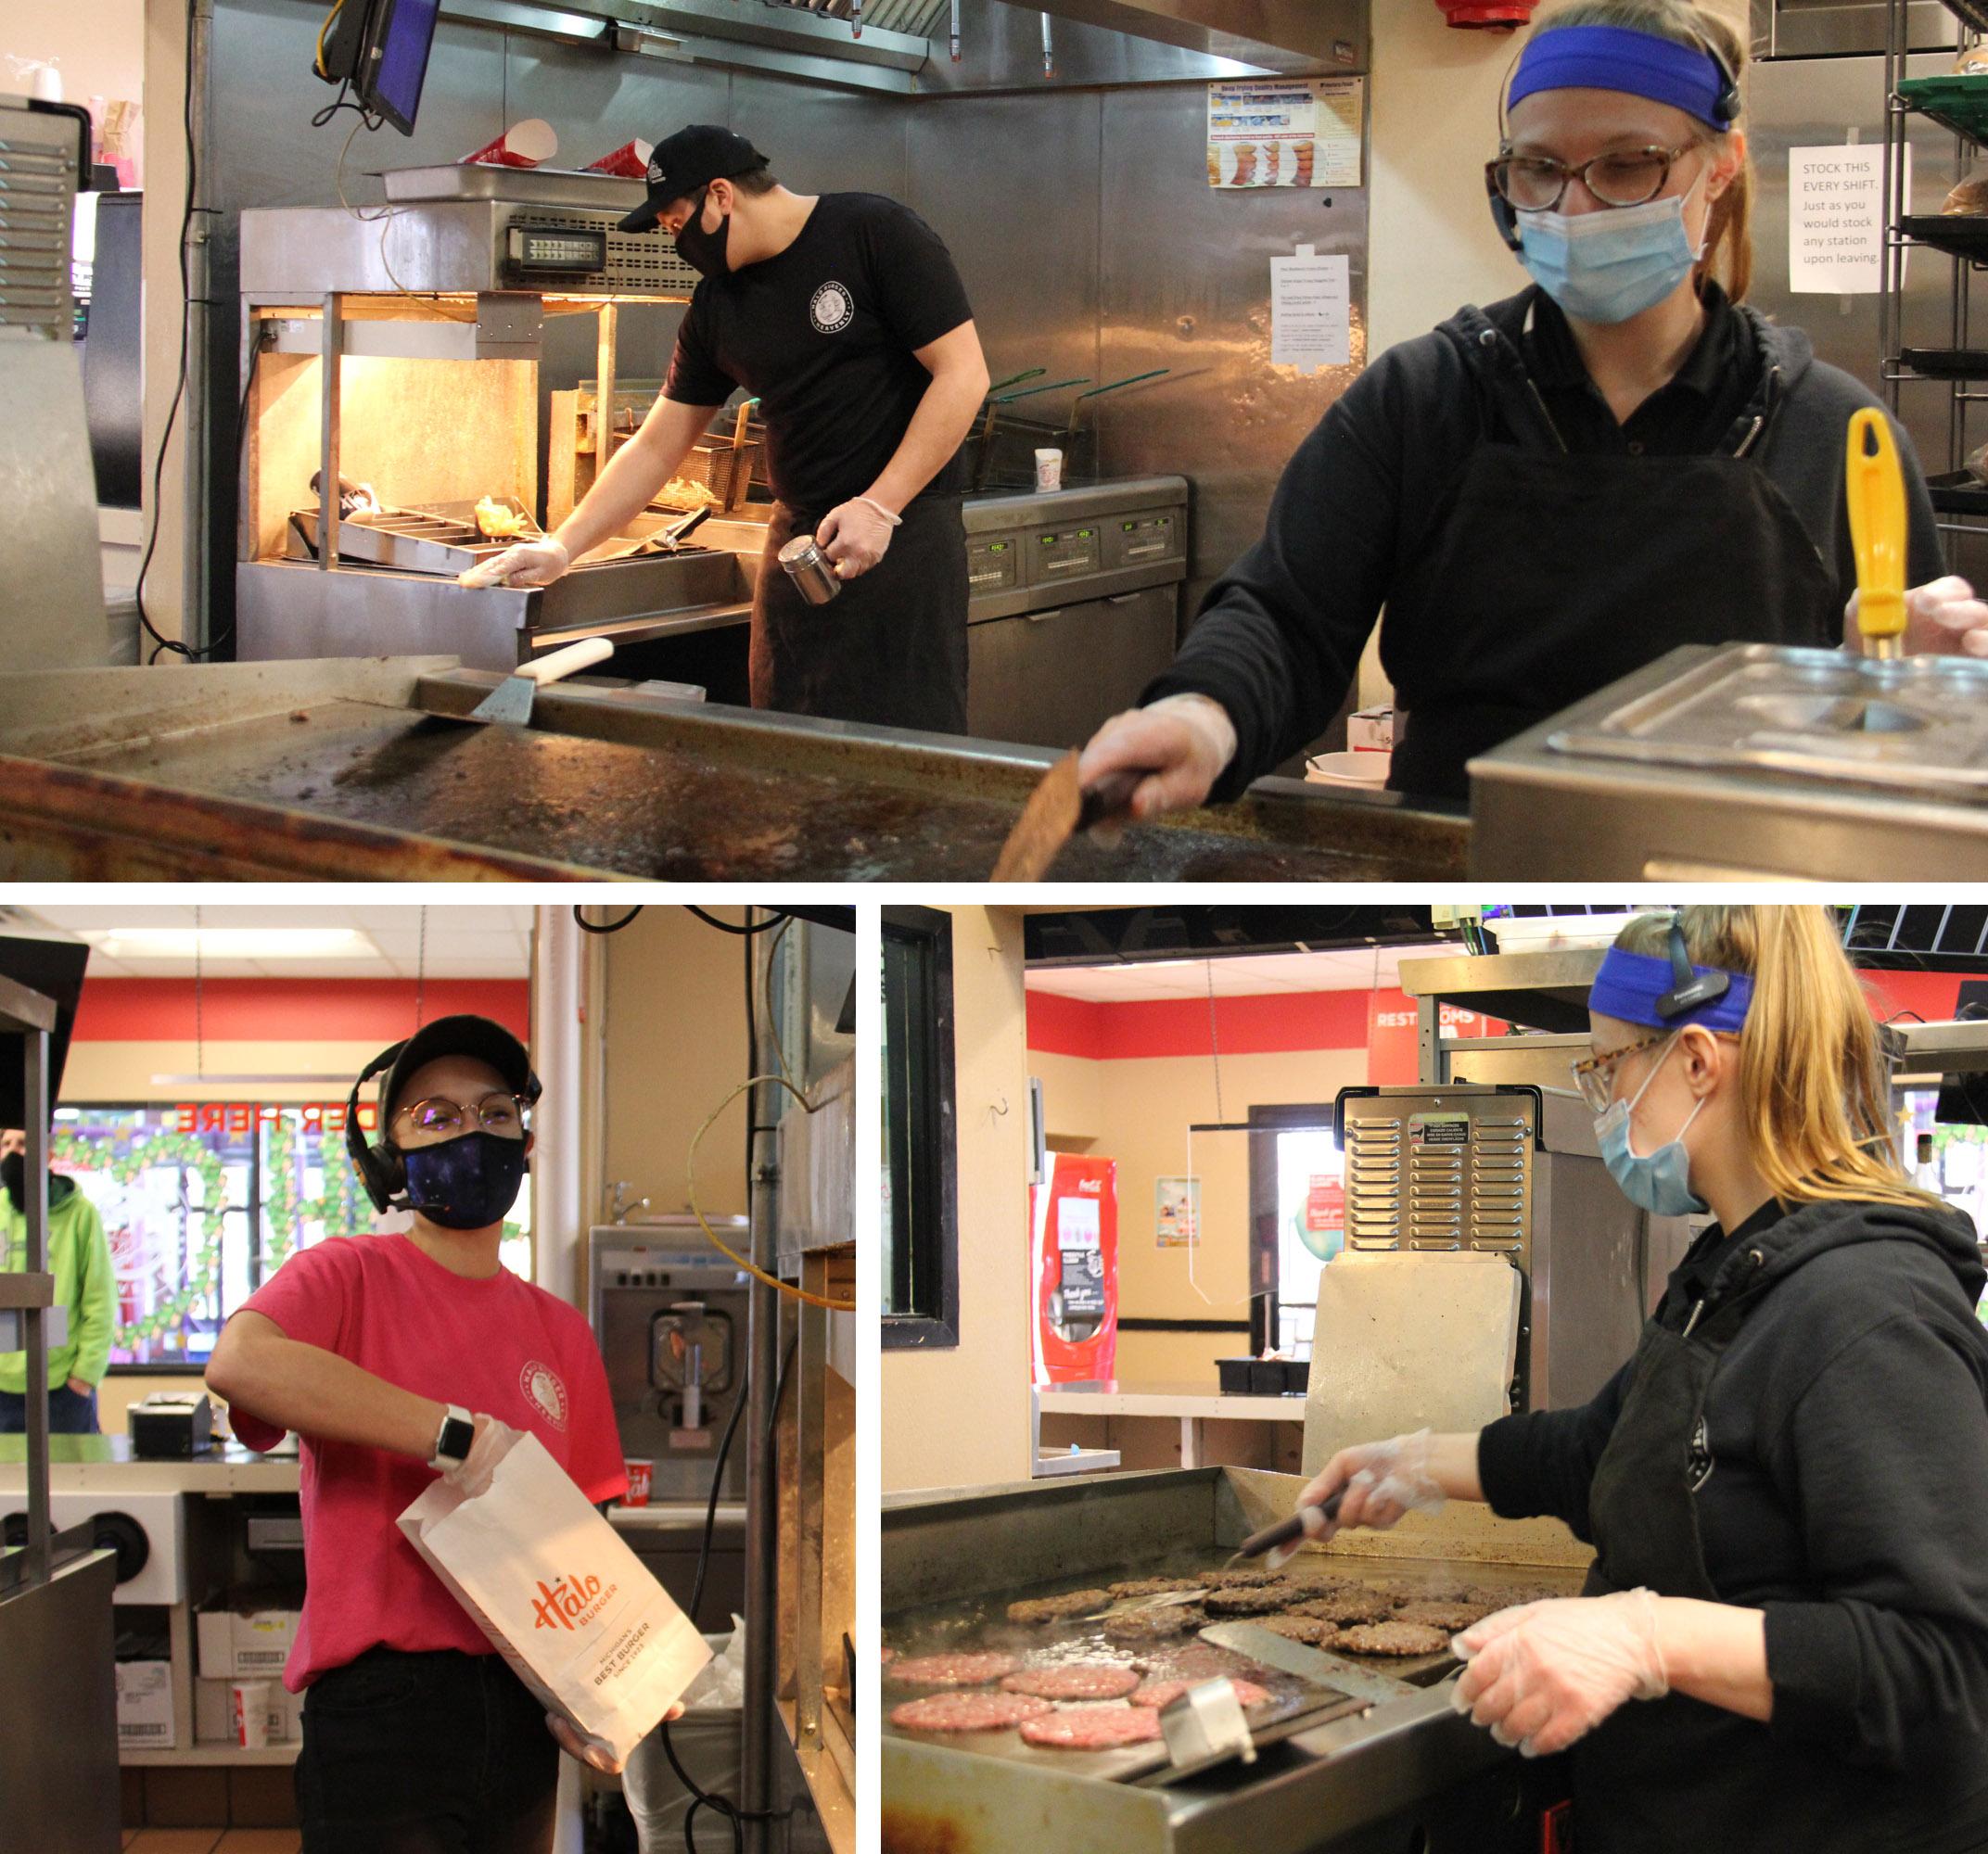 Employees at Halo Burger, Grand Blanc, MI